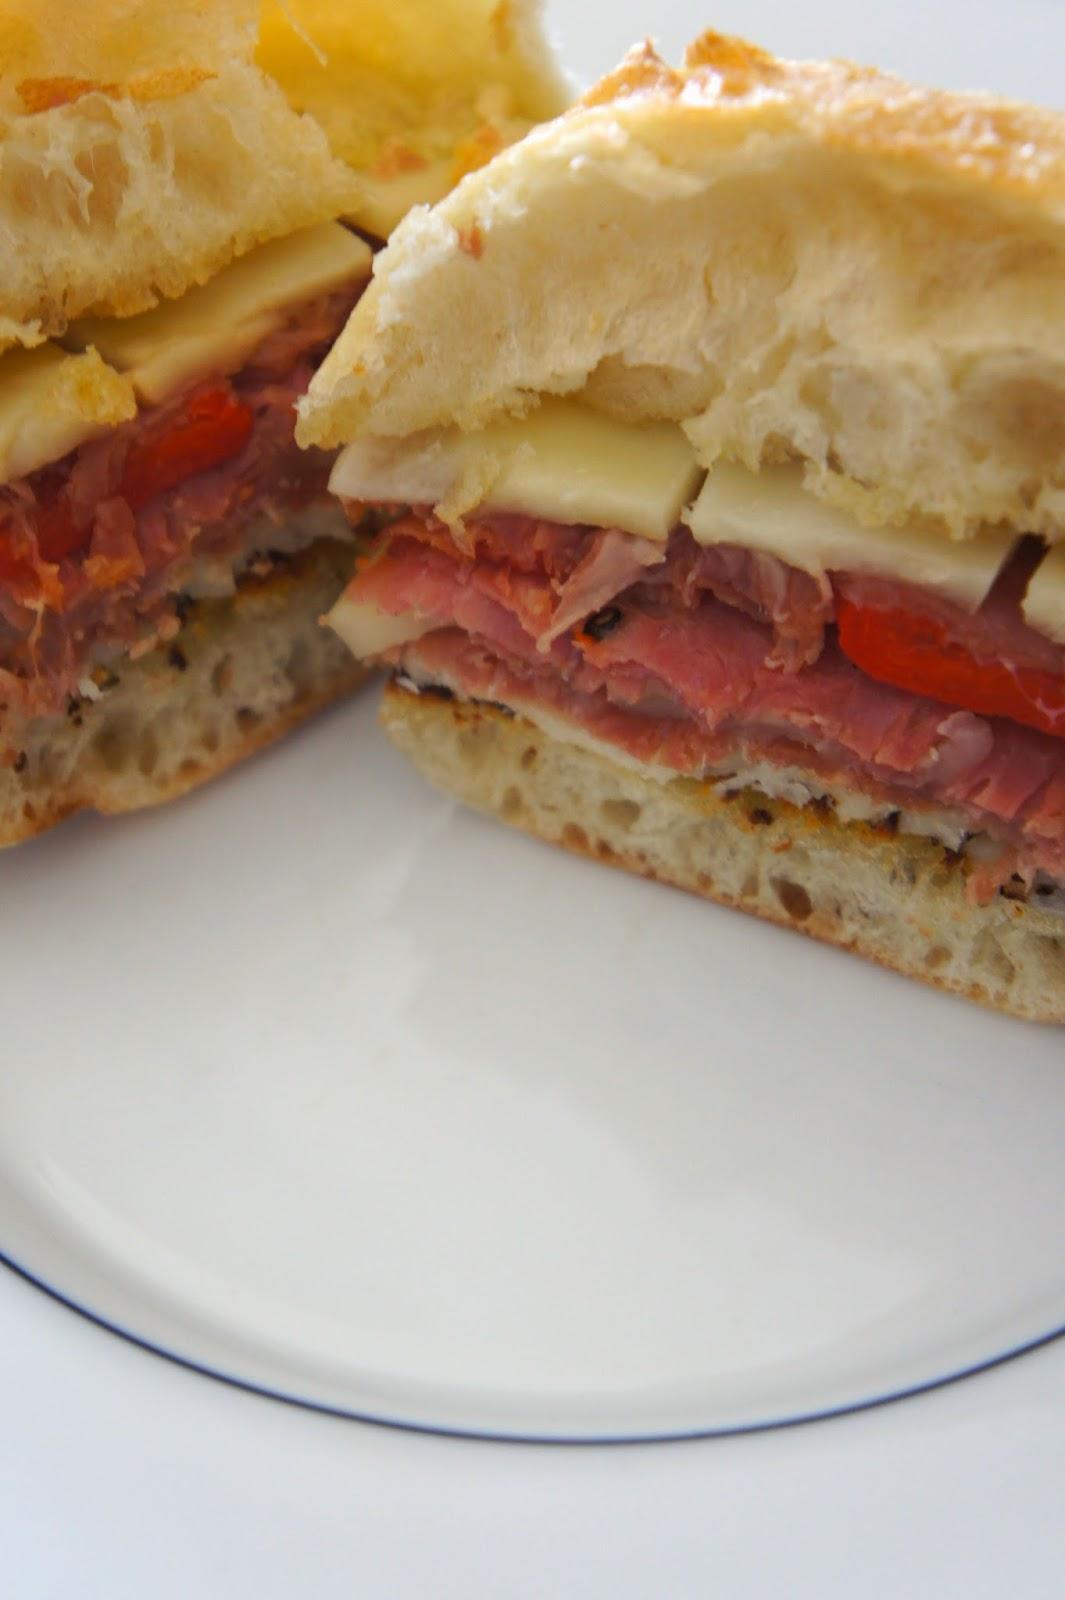 Italian Sandwich: Savory Sweet and Satisfying